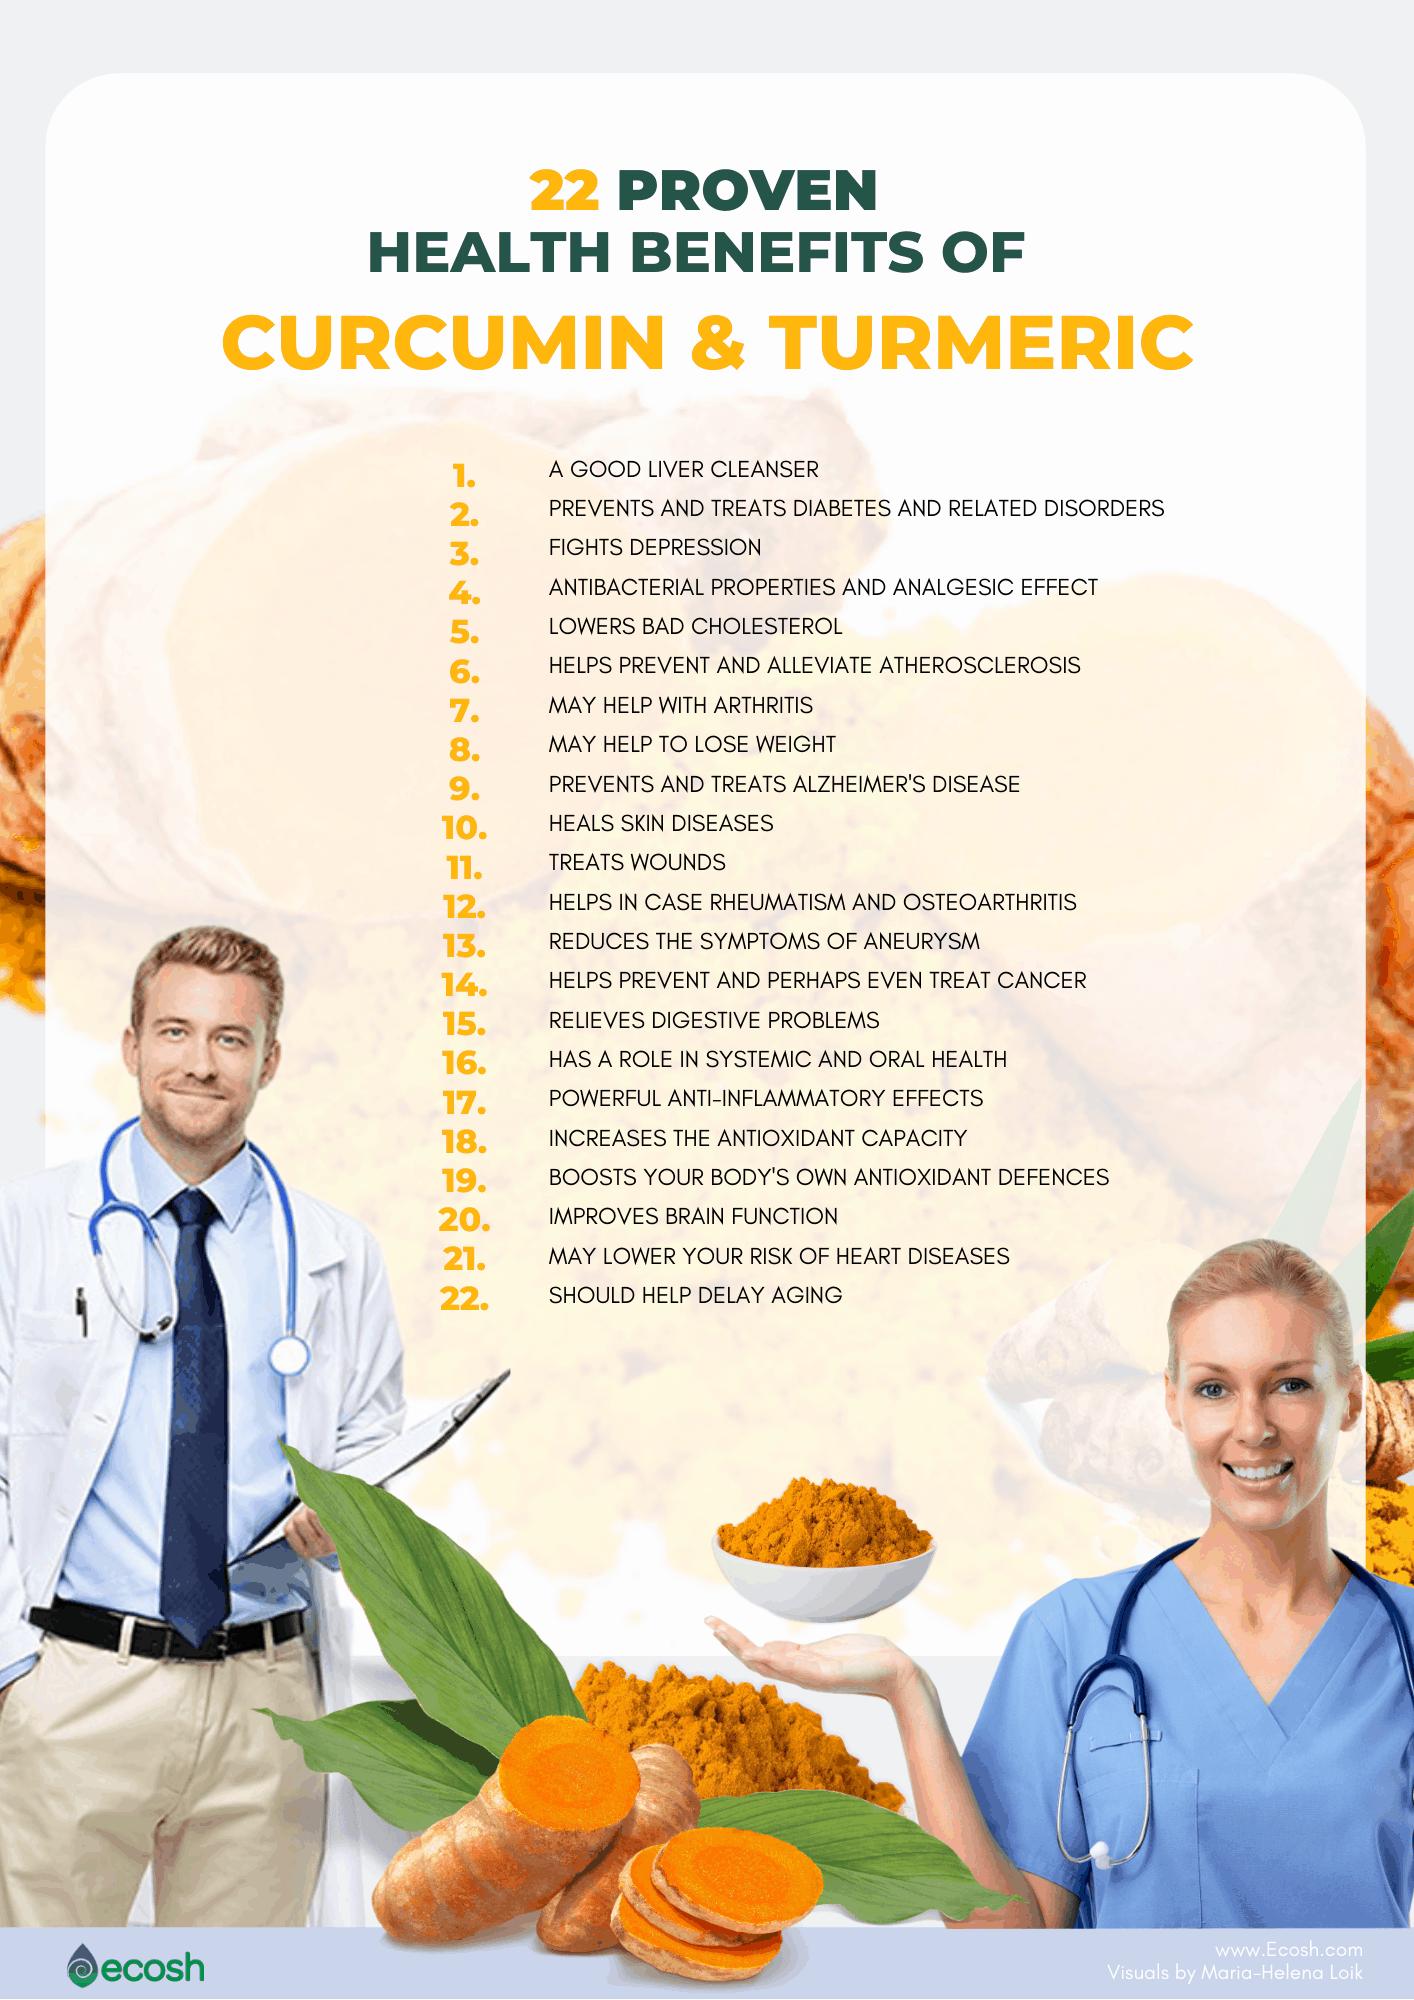 Ecosh_22_Proven_Health_Benefits_of_Turmeric_Health_Benefits_of_Curcumin_Turmeric_Healt_Benefits_